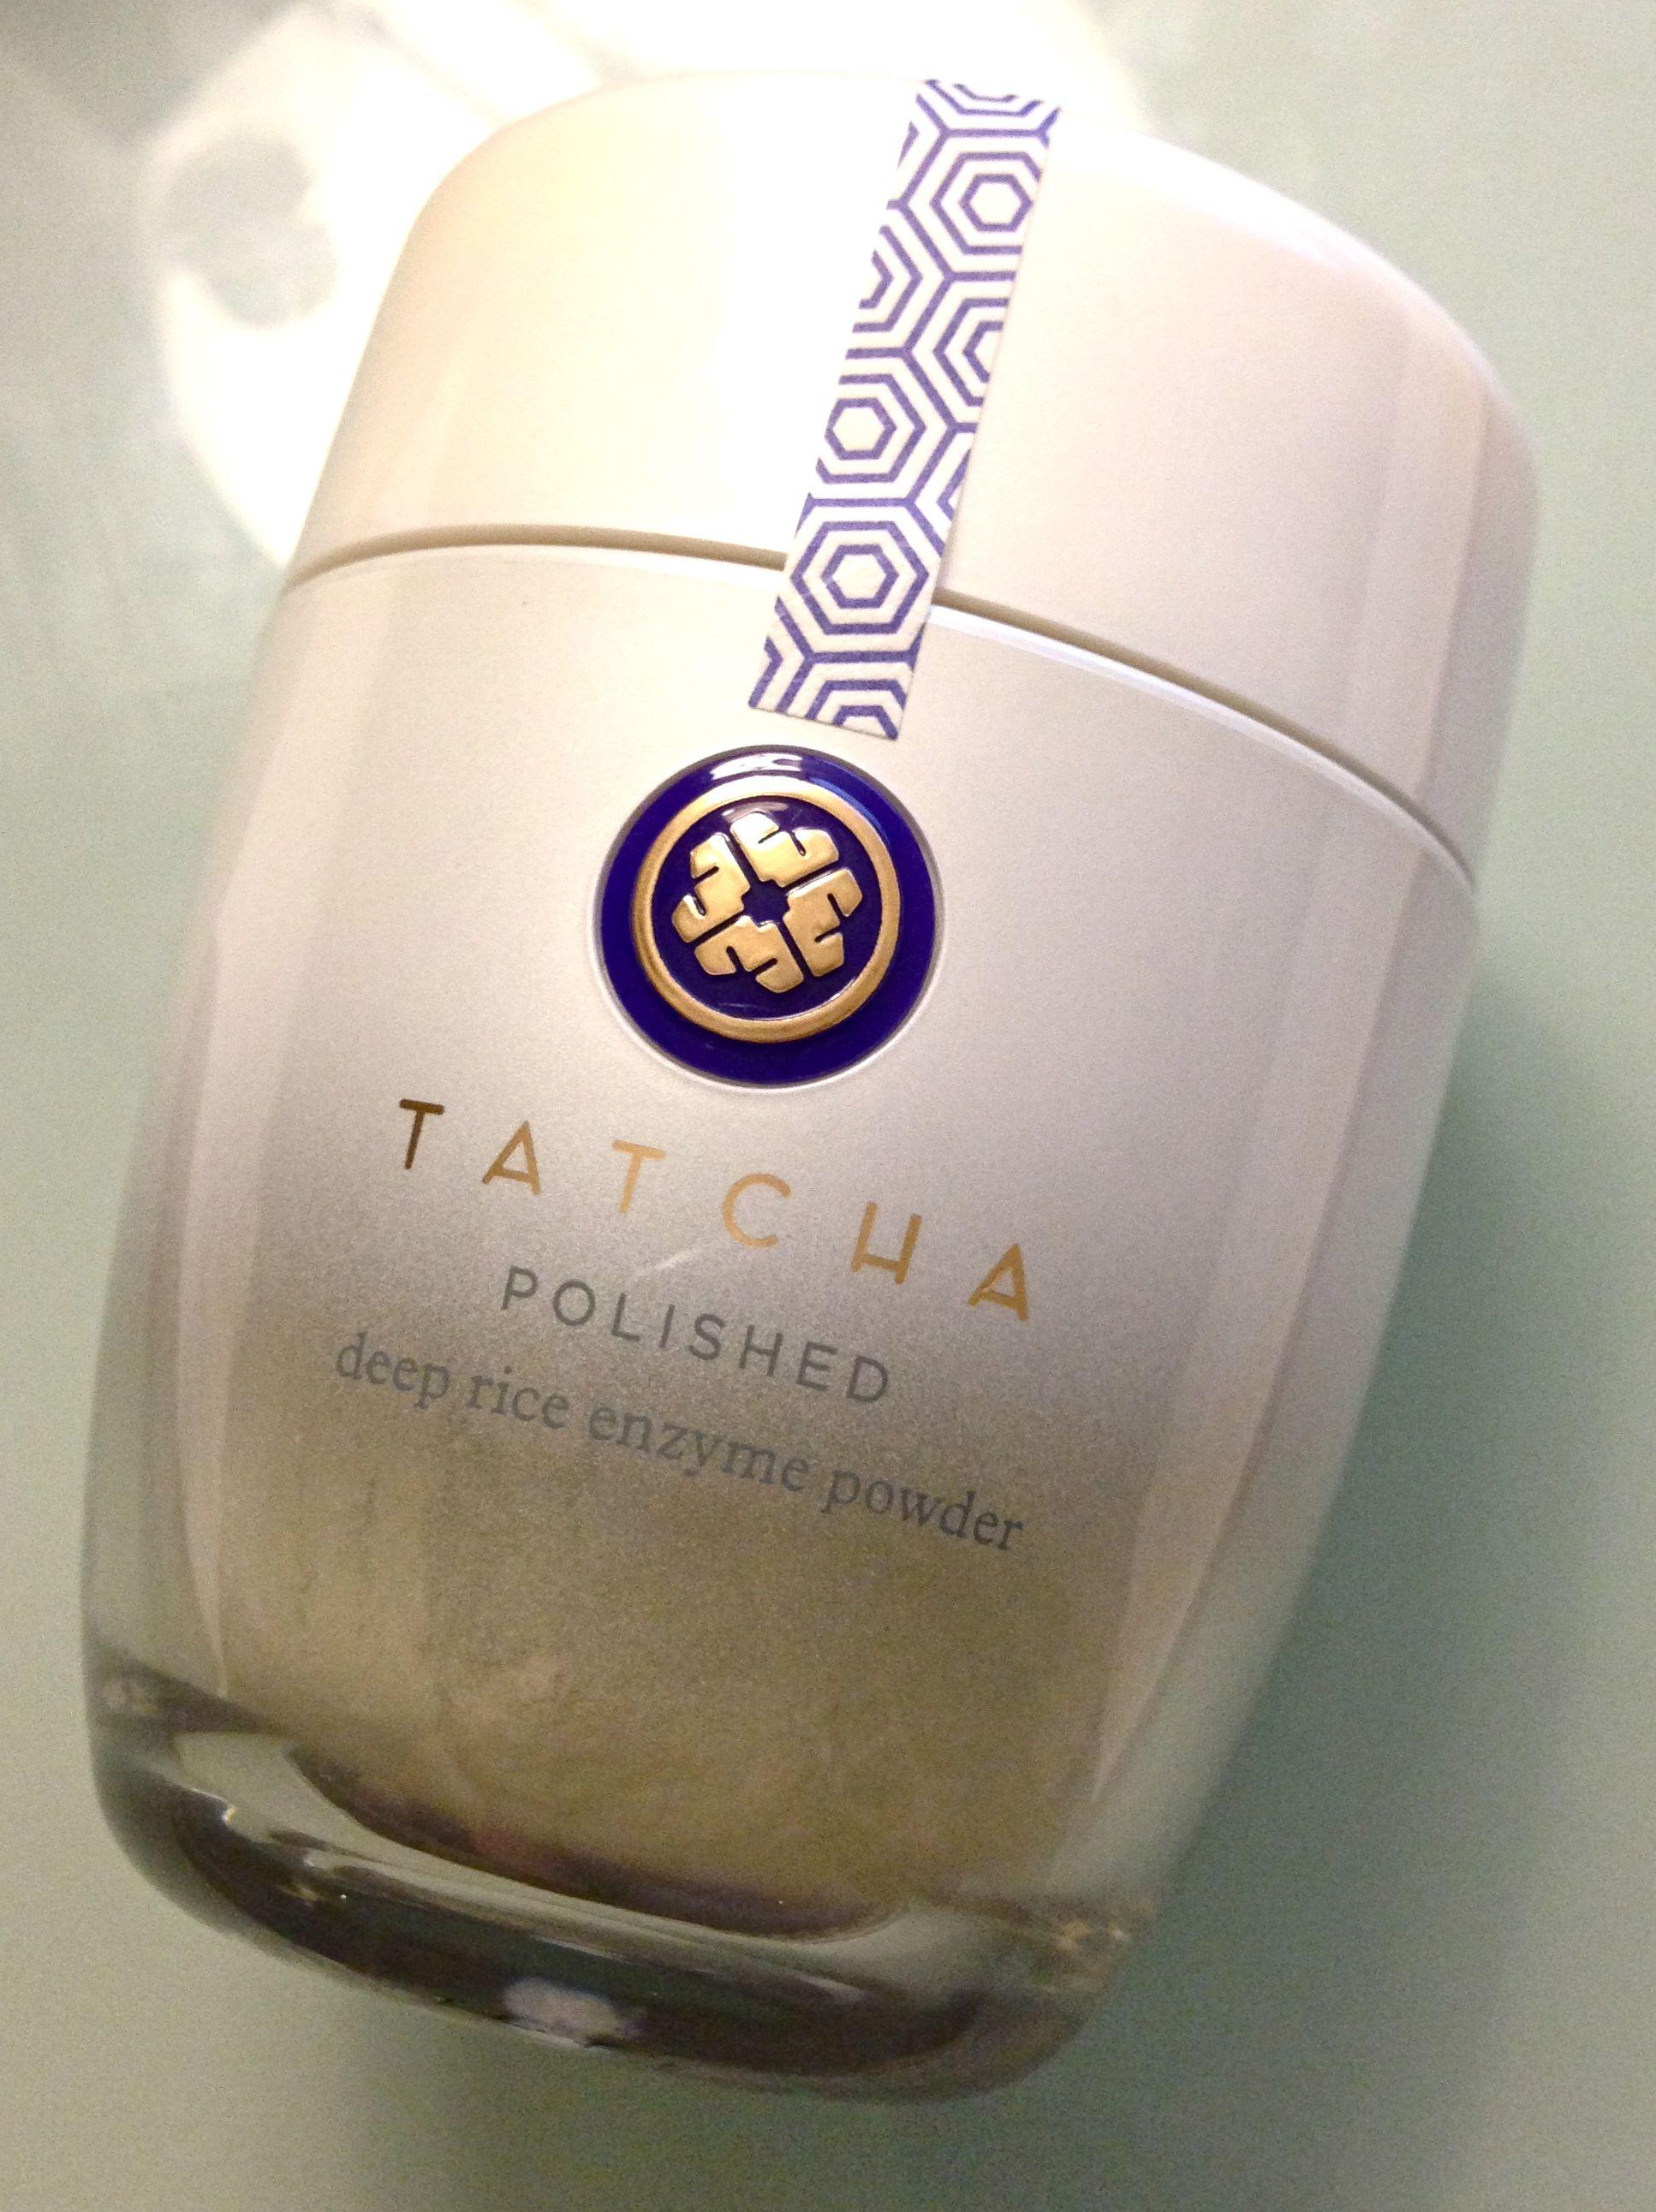 tatcha polished deep rice enzyme powder Oily combination